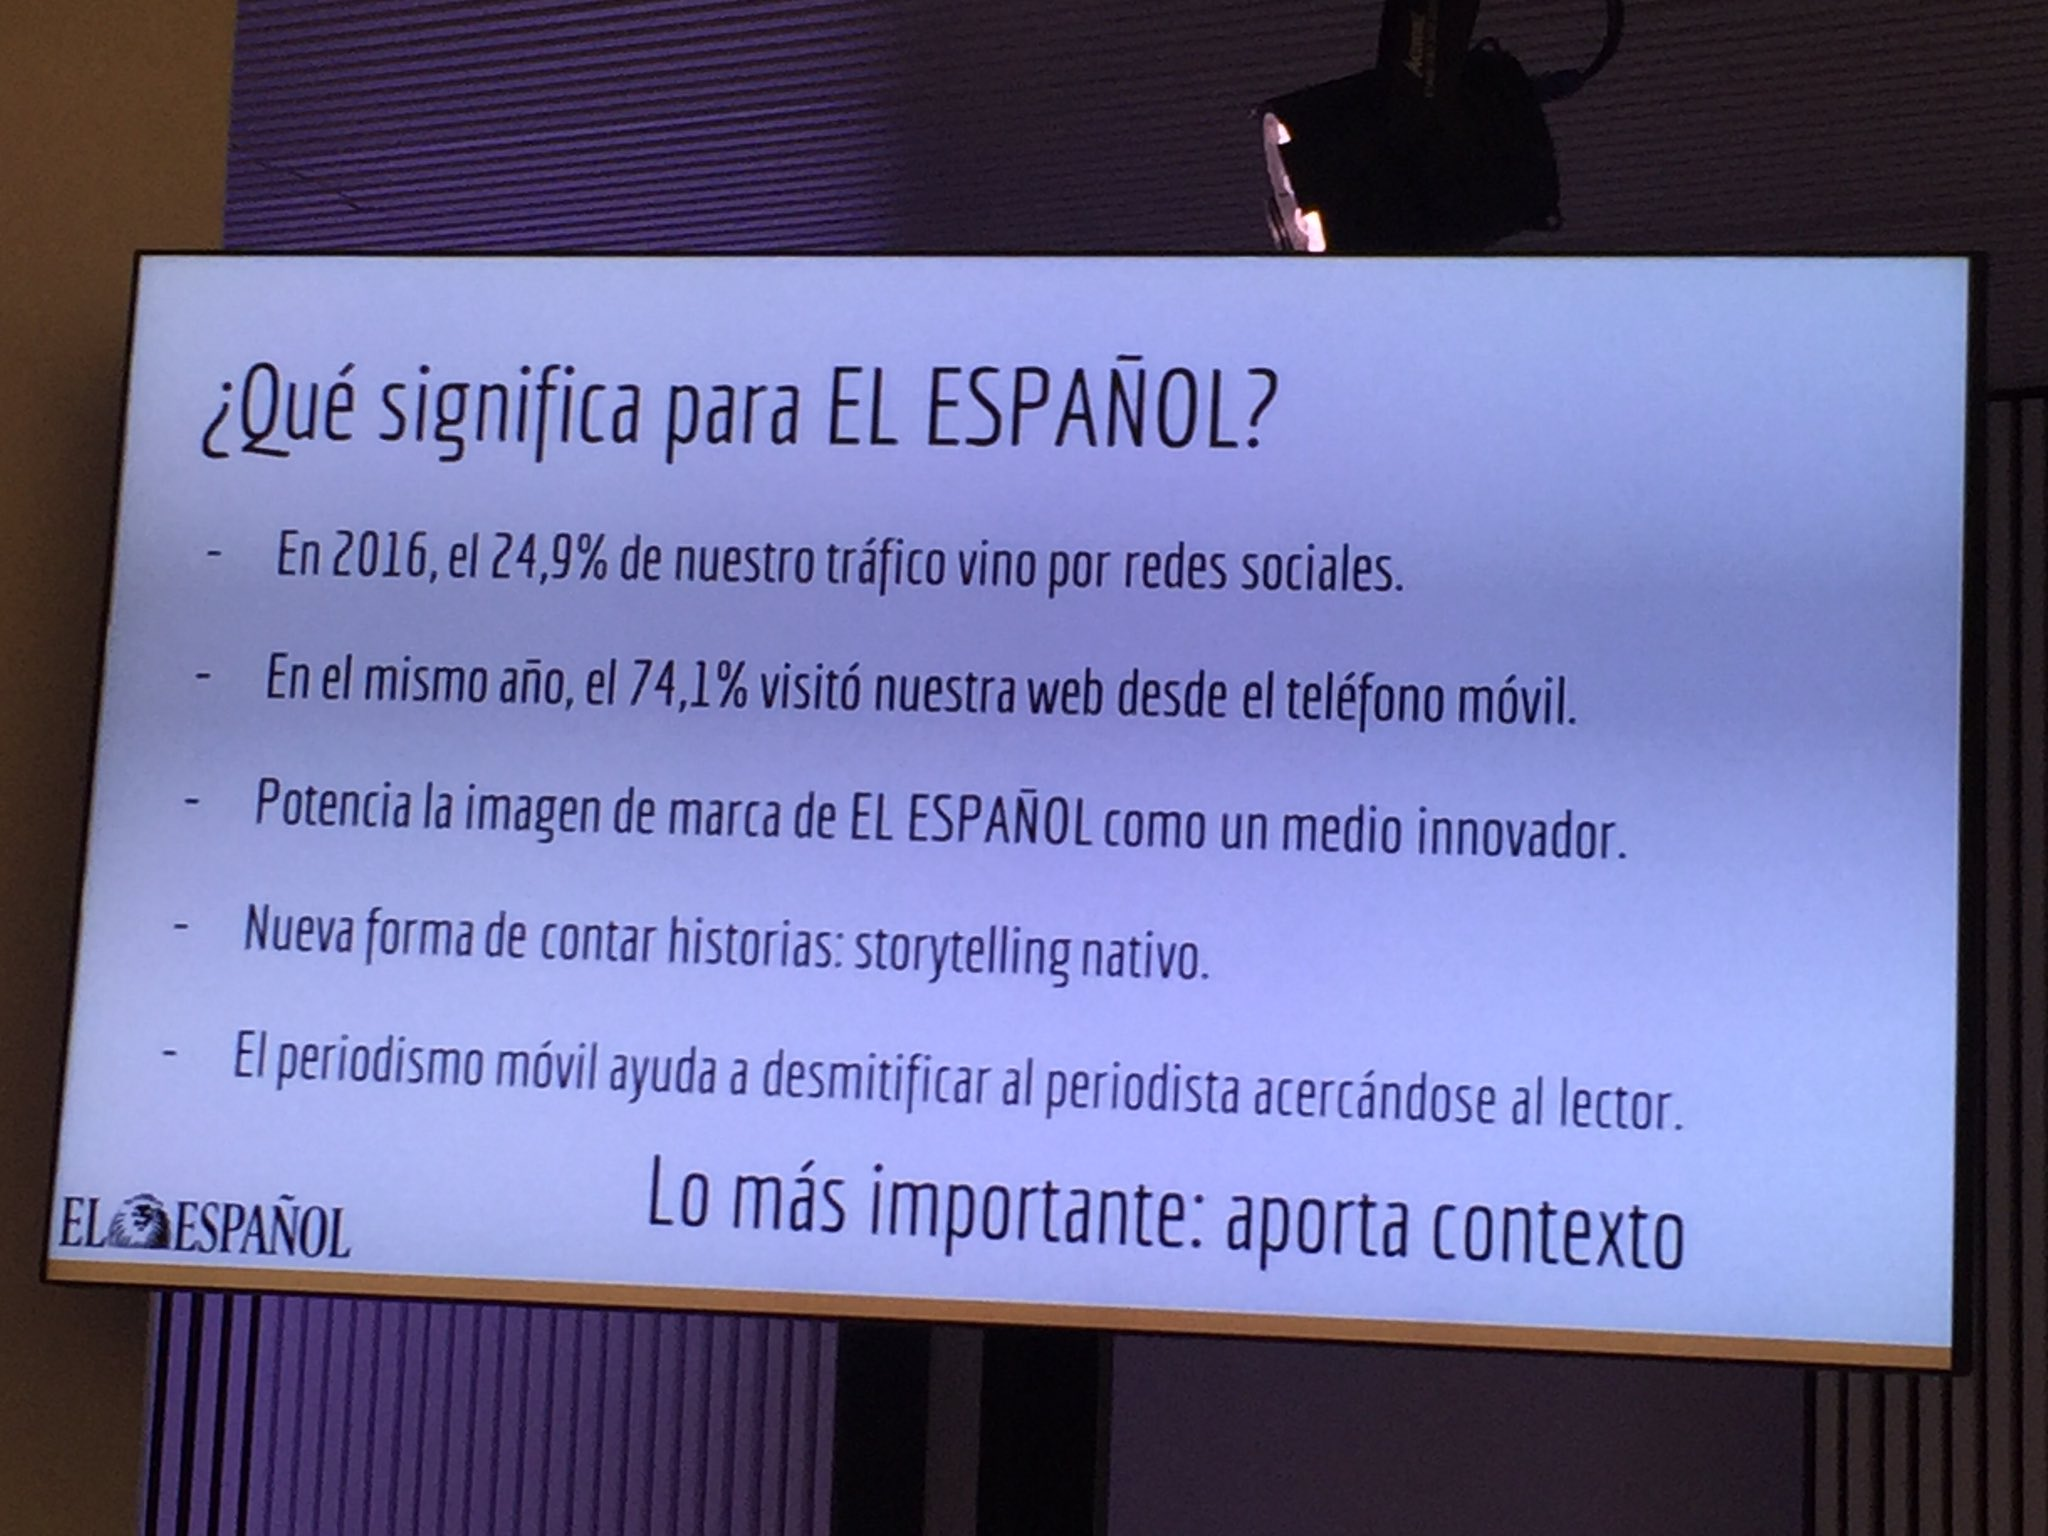 Los datos de @elespanolcom son también aplastantes. 74,1% tráfico móvil #MoJoBCN https://t.co/lAUuycoHpB